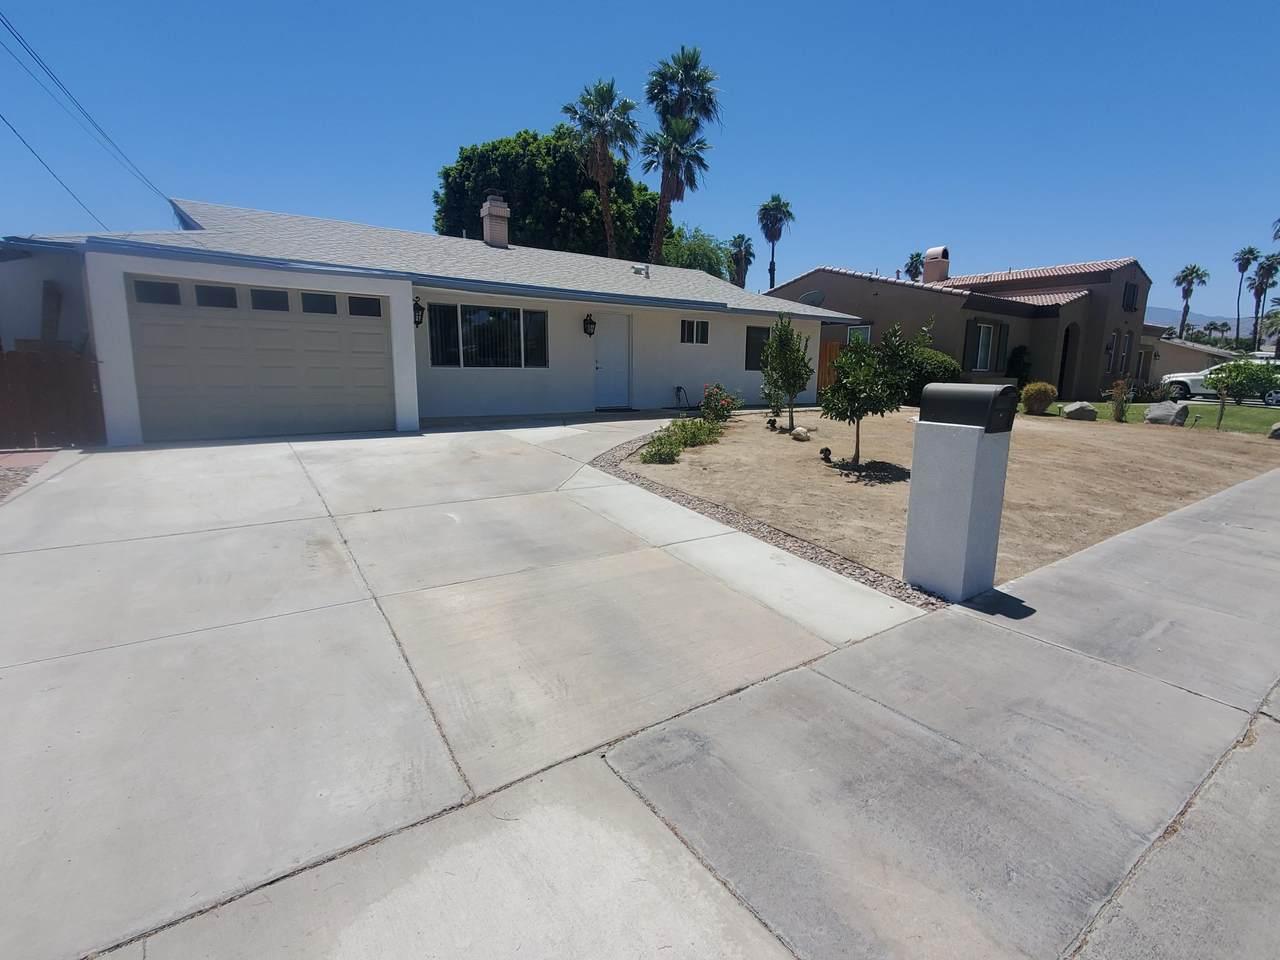 77255 California Drive - Photo 1